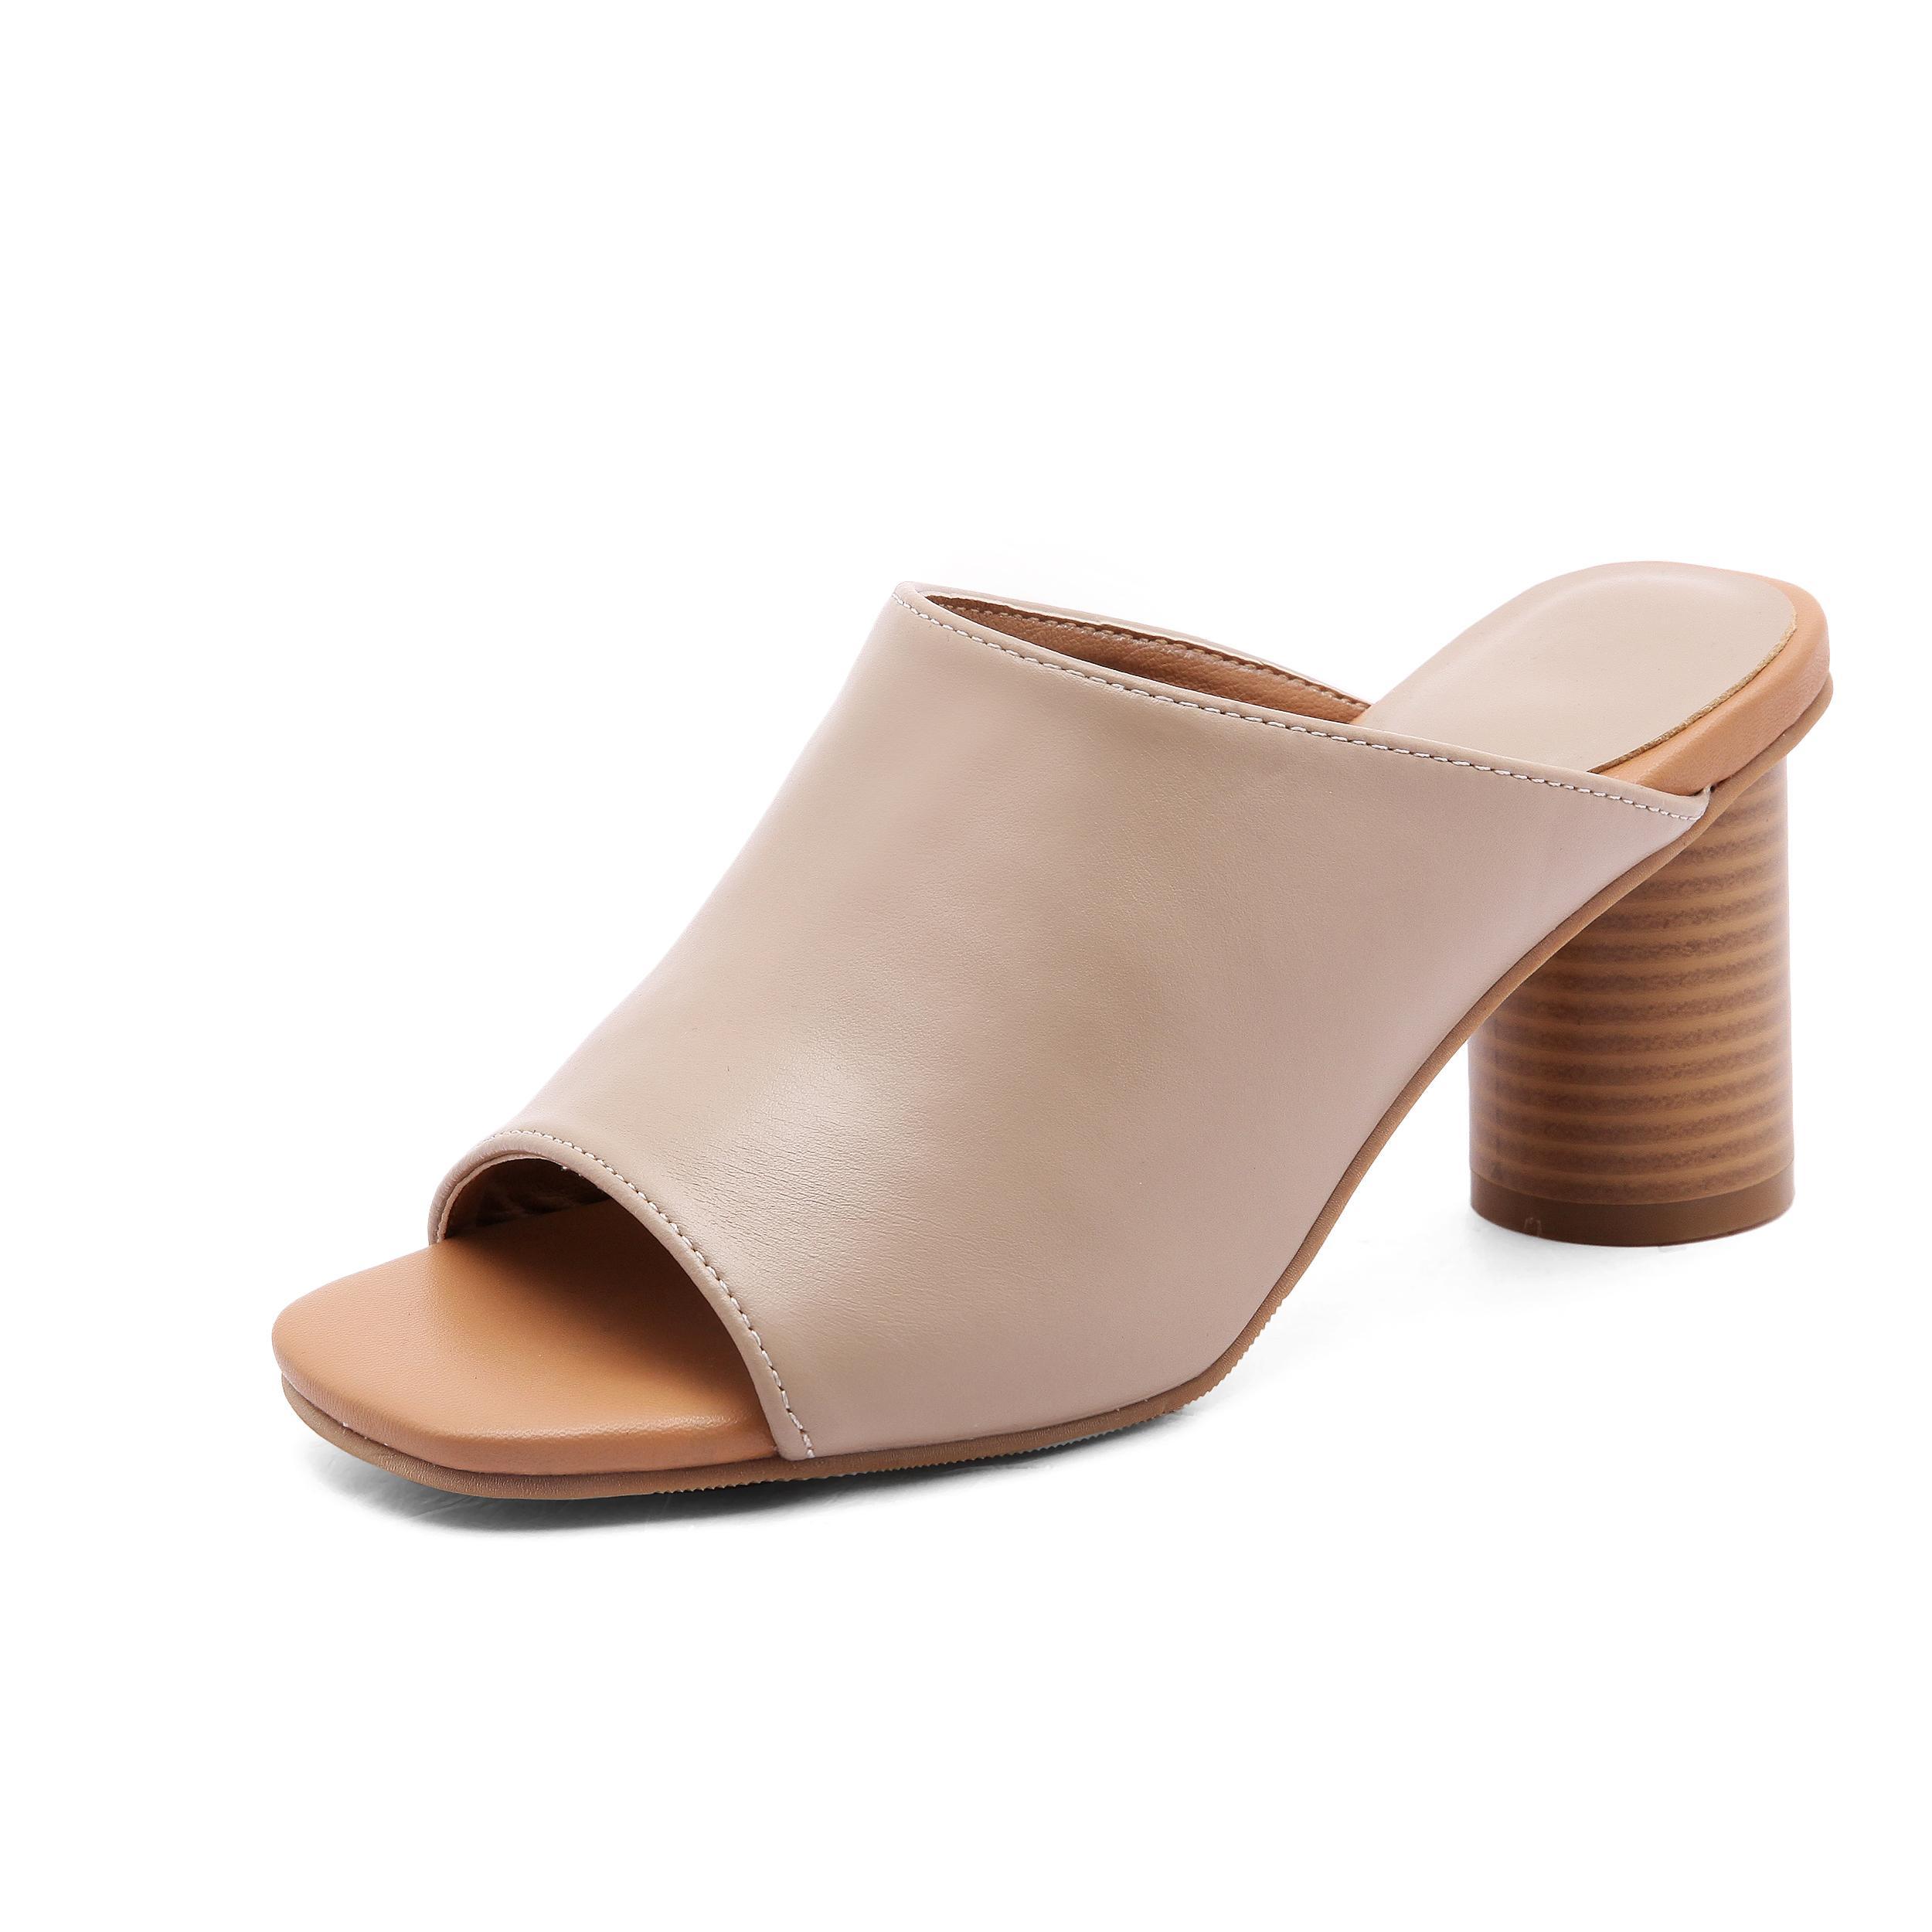 9dd446036653 Sandals women Summer 2019 New Style Korean Style Outer Wear Fashion Slipper  Leather Block Heel High